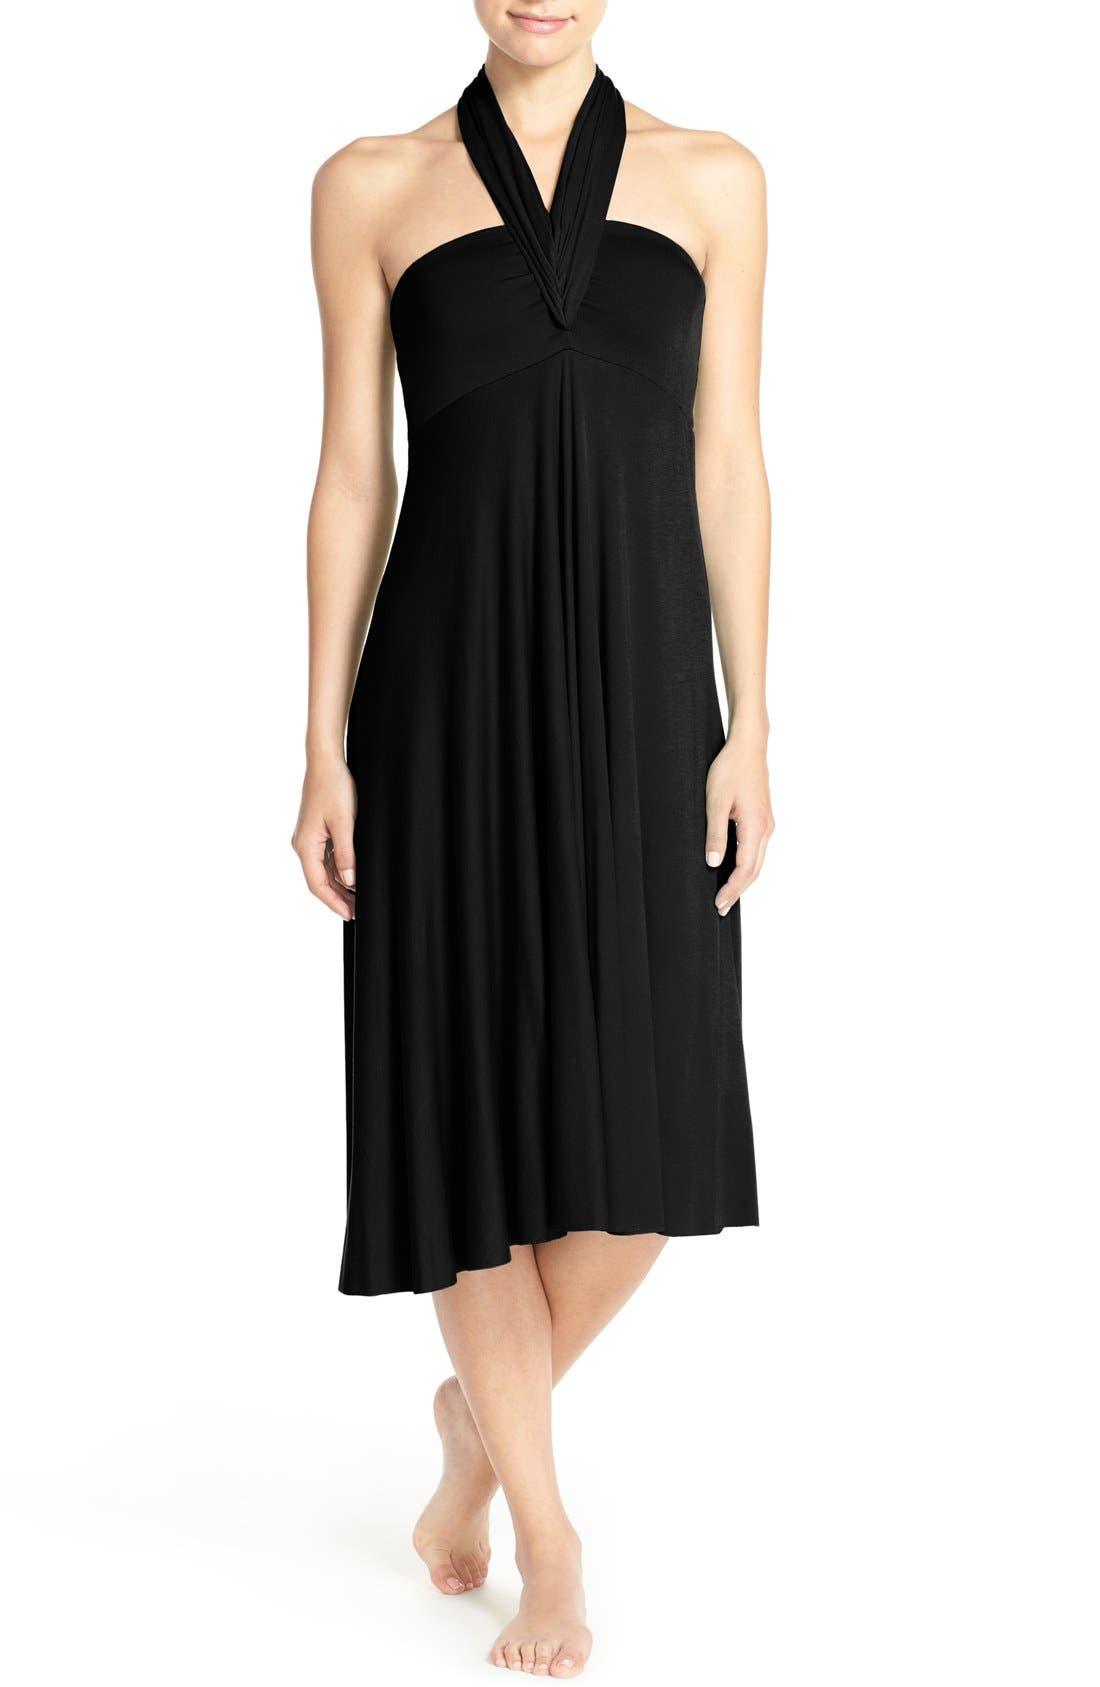 Main Image - Elan Convertible Cover-Up Dress